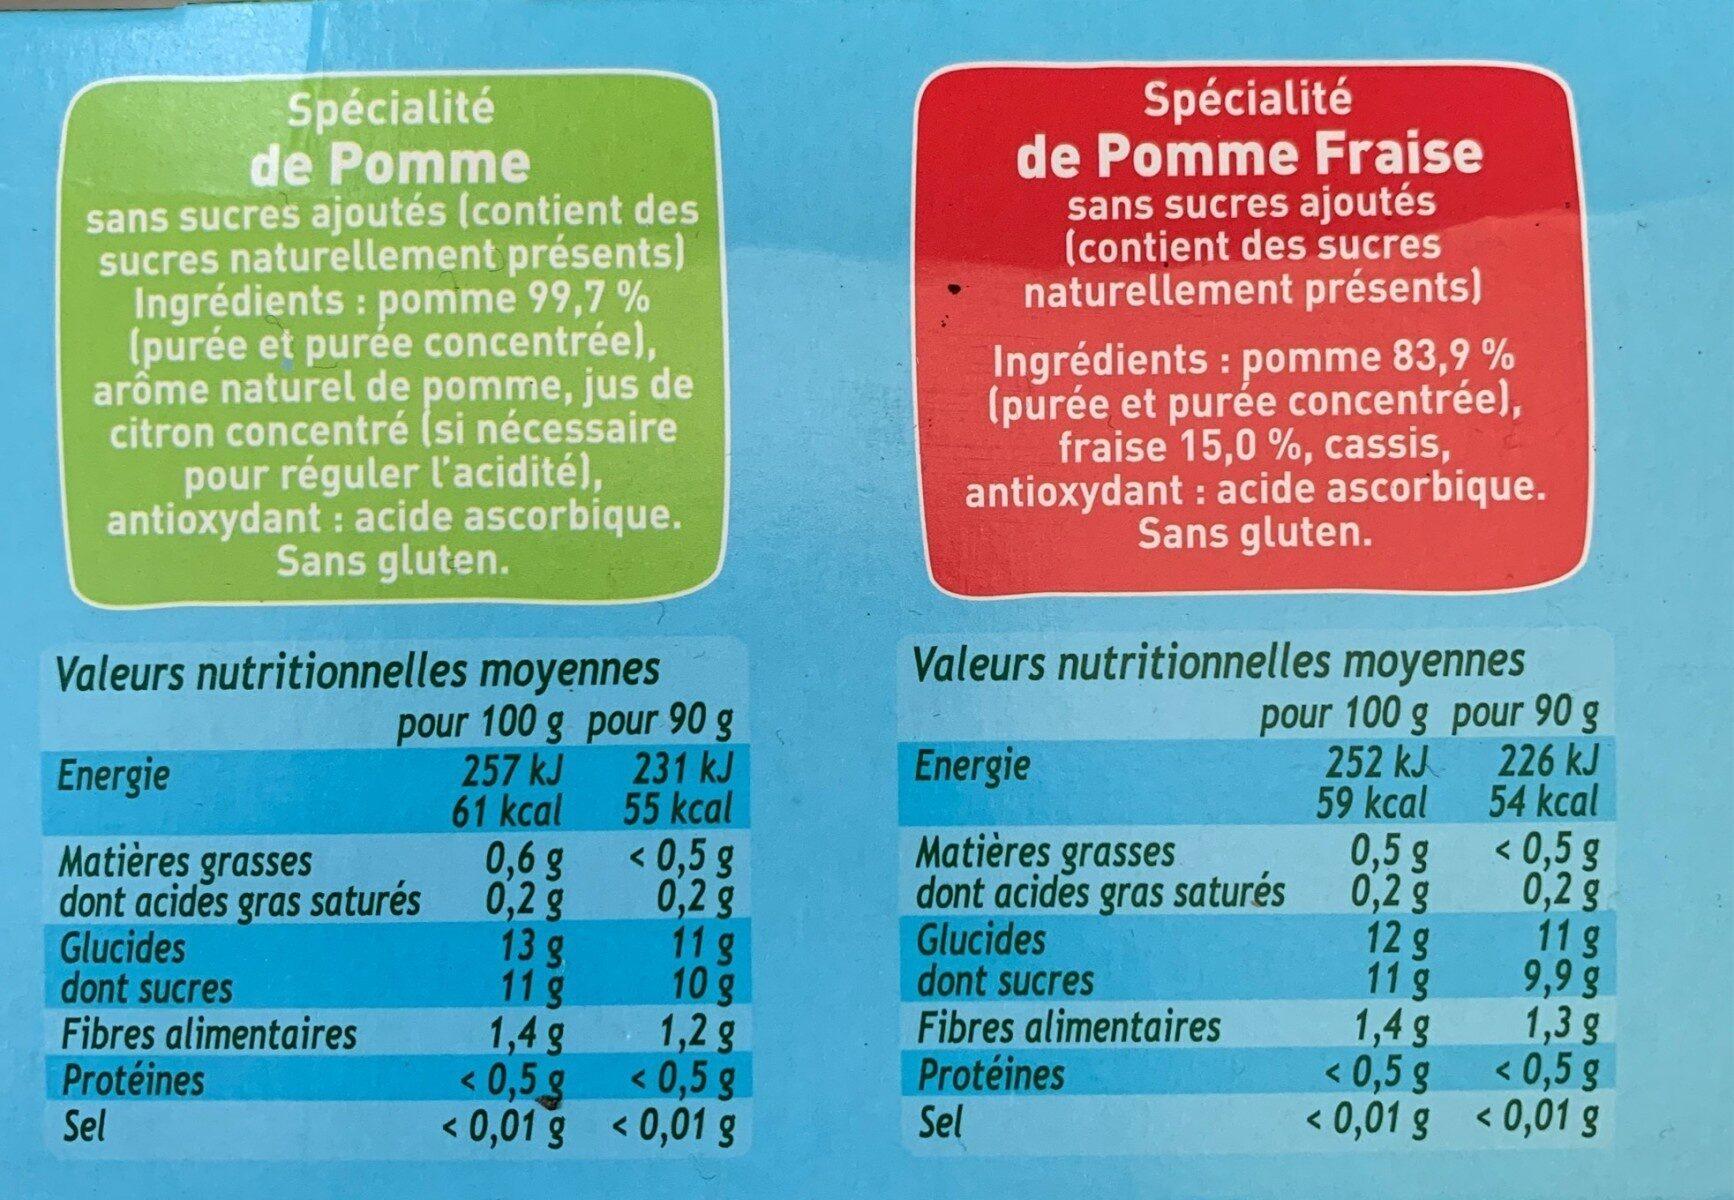 POM'POTES SSA Pomme/Pomme Fraise - Informations nutritionnelles - fr